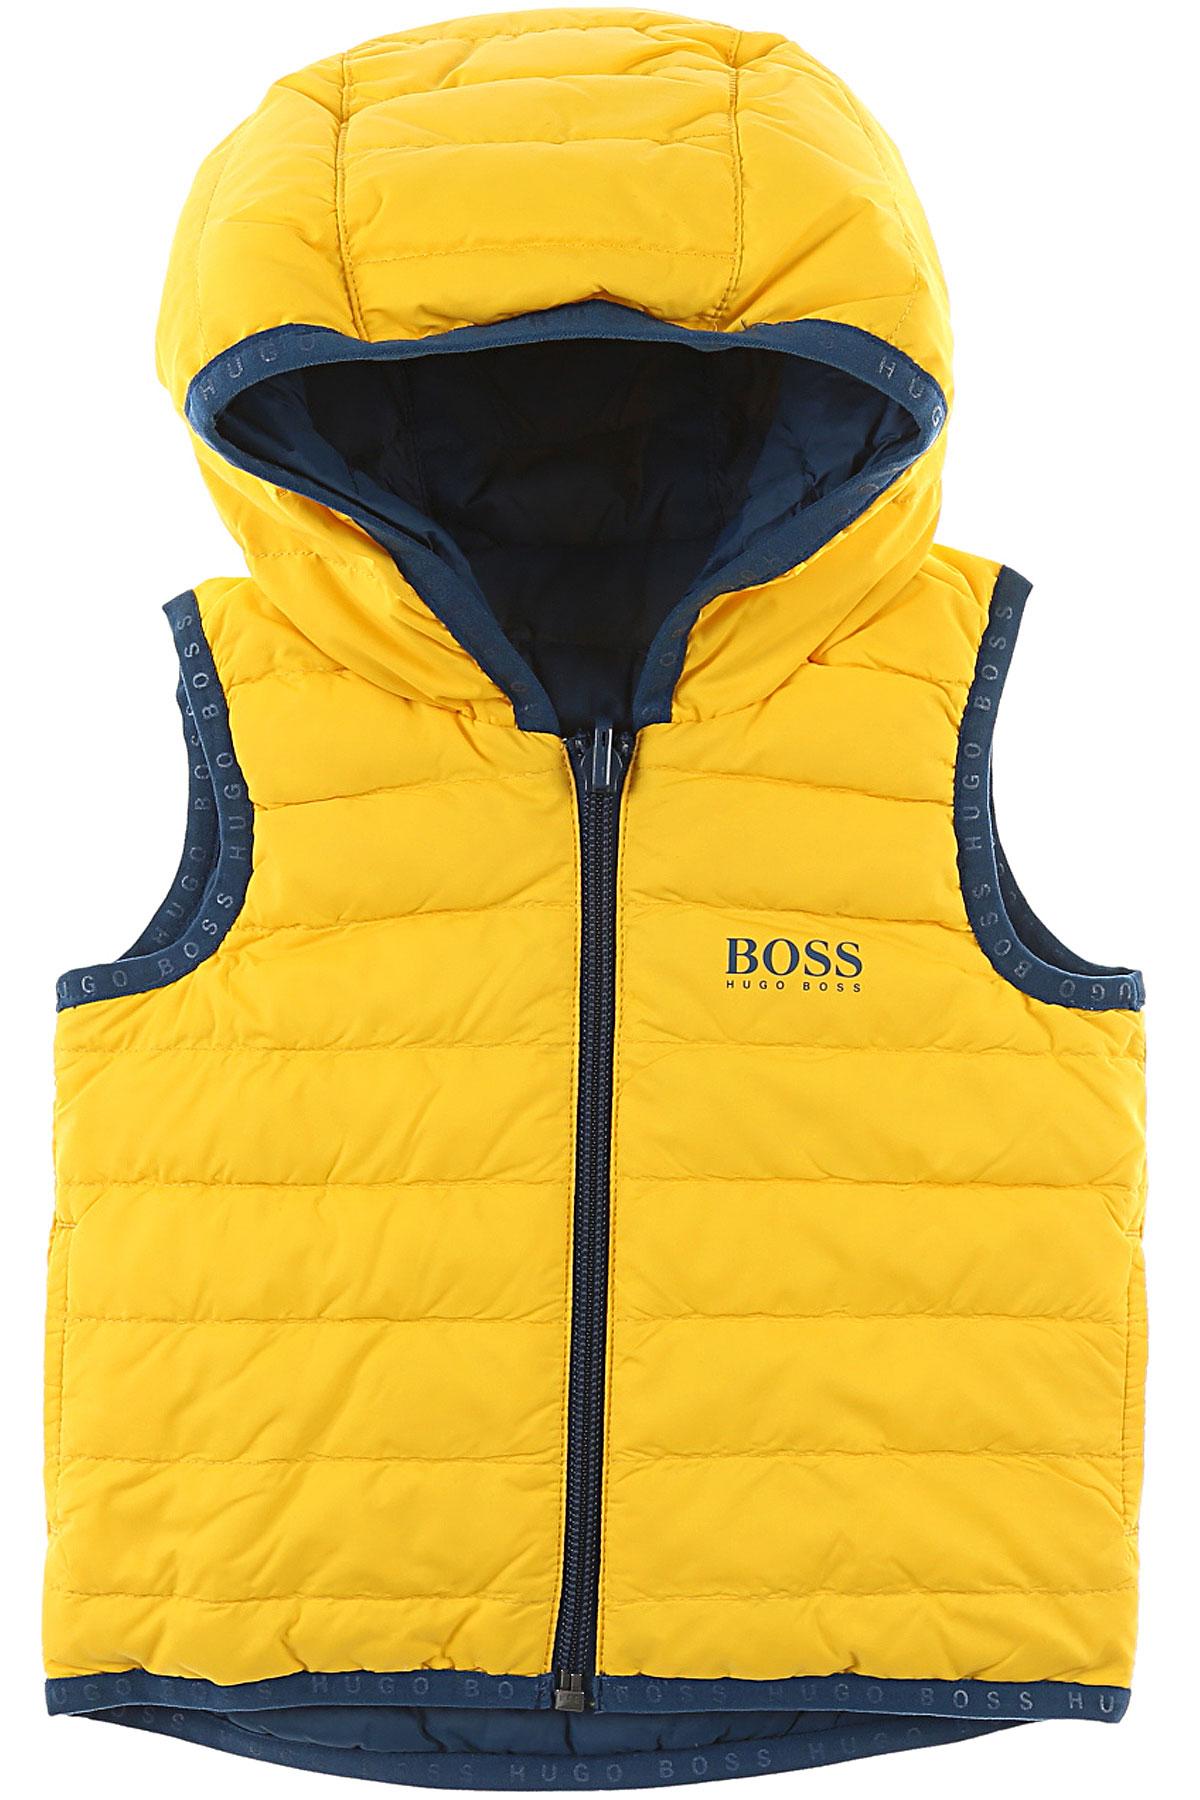 Image of Hugo Boss Baby Jacket for Boys, Yellow, polyamide, 2017, 18M 2Y 9M